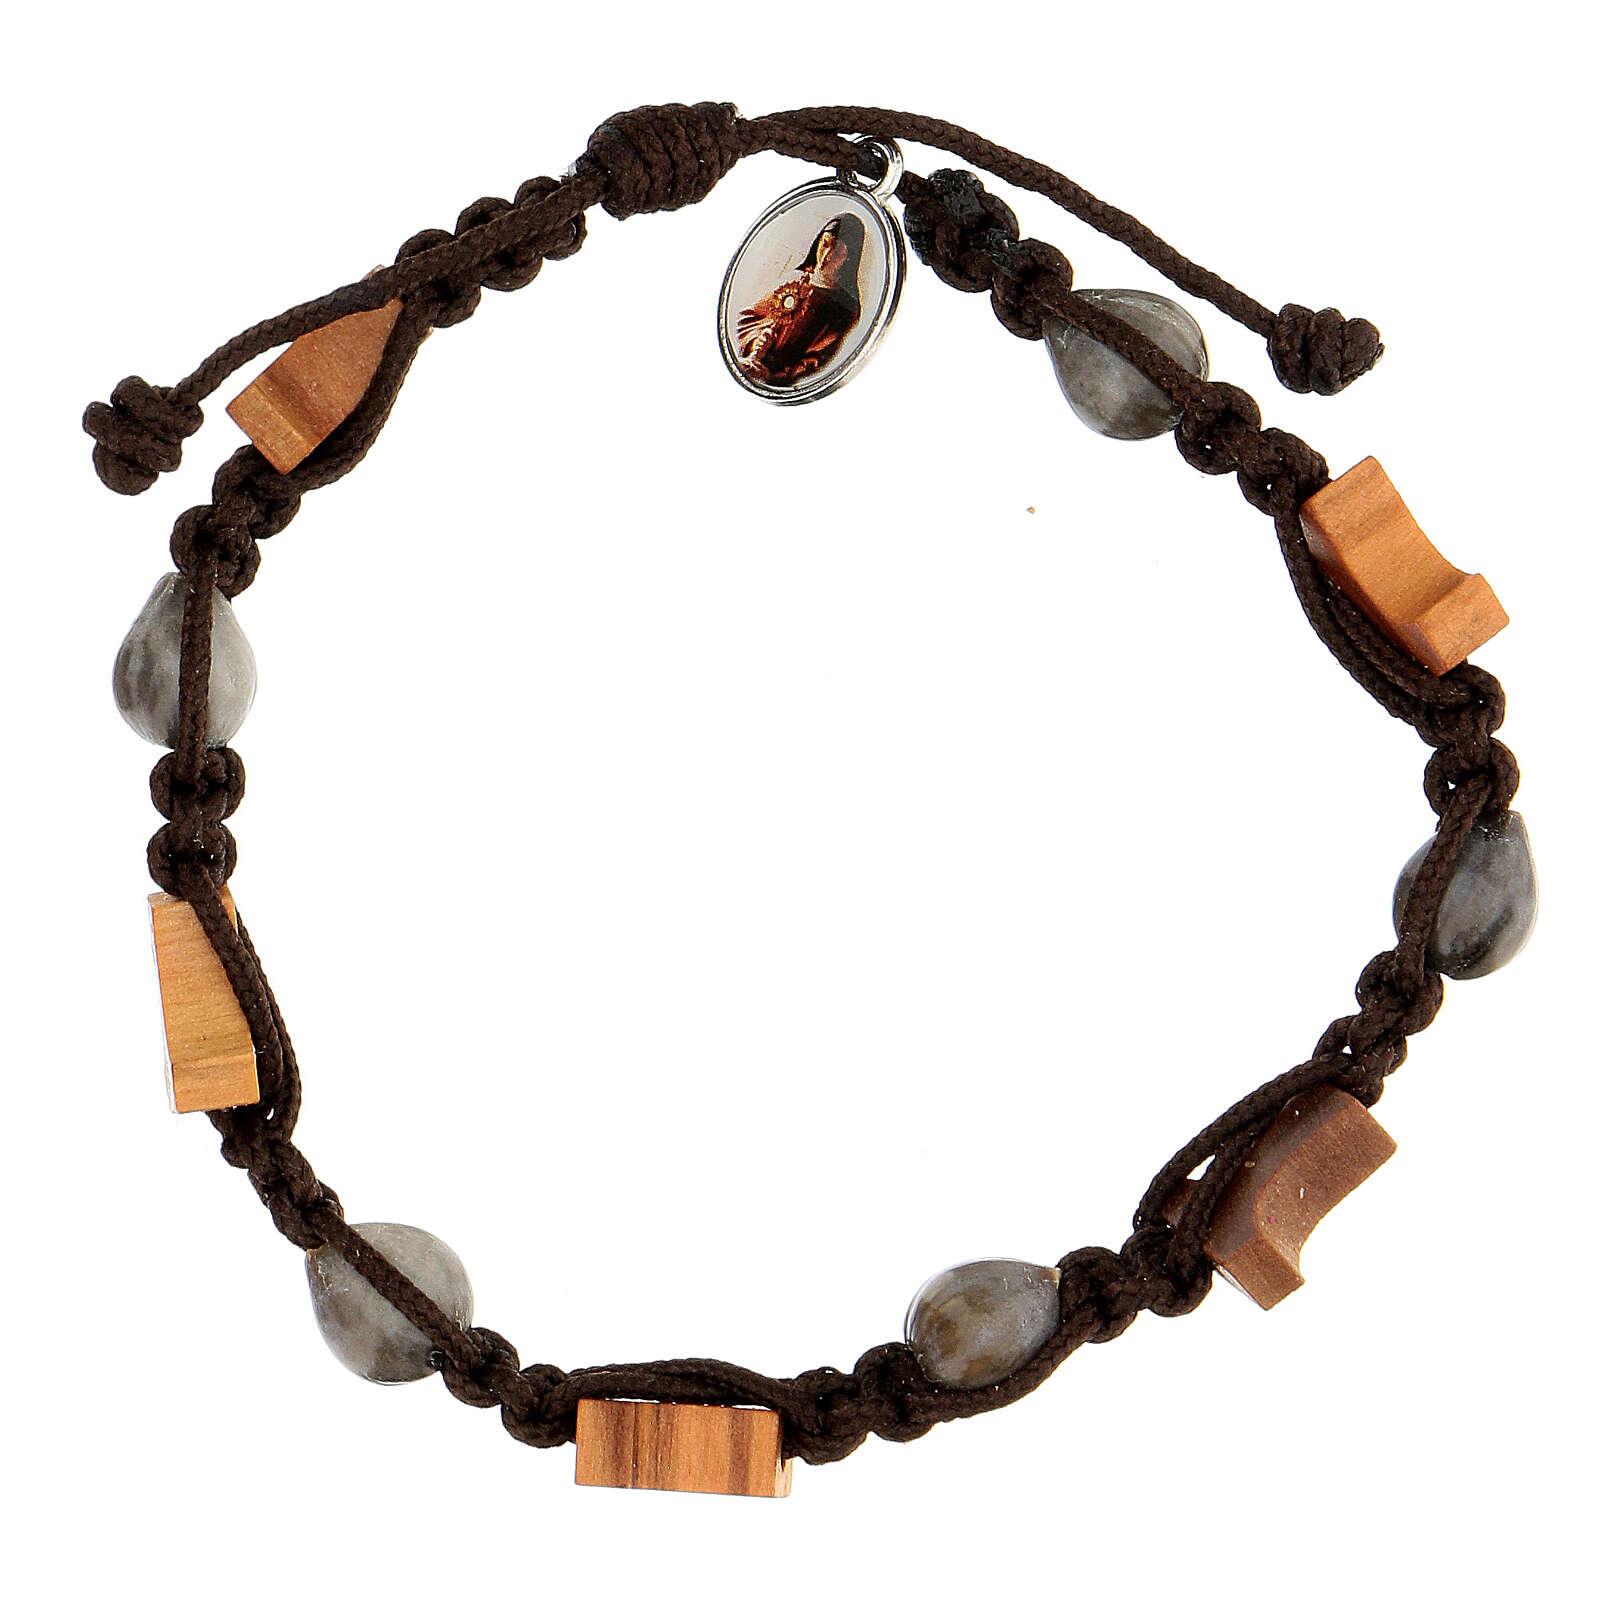 Bracelet croix tau Medjugorje corde marron Larmes-de-Job 4